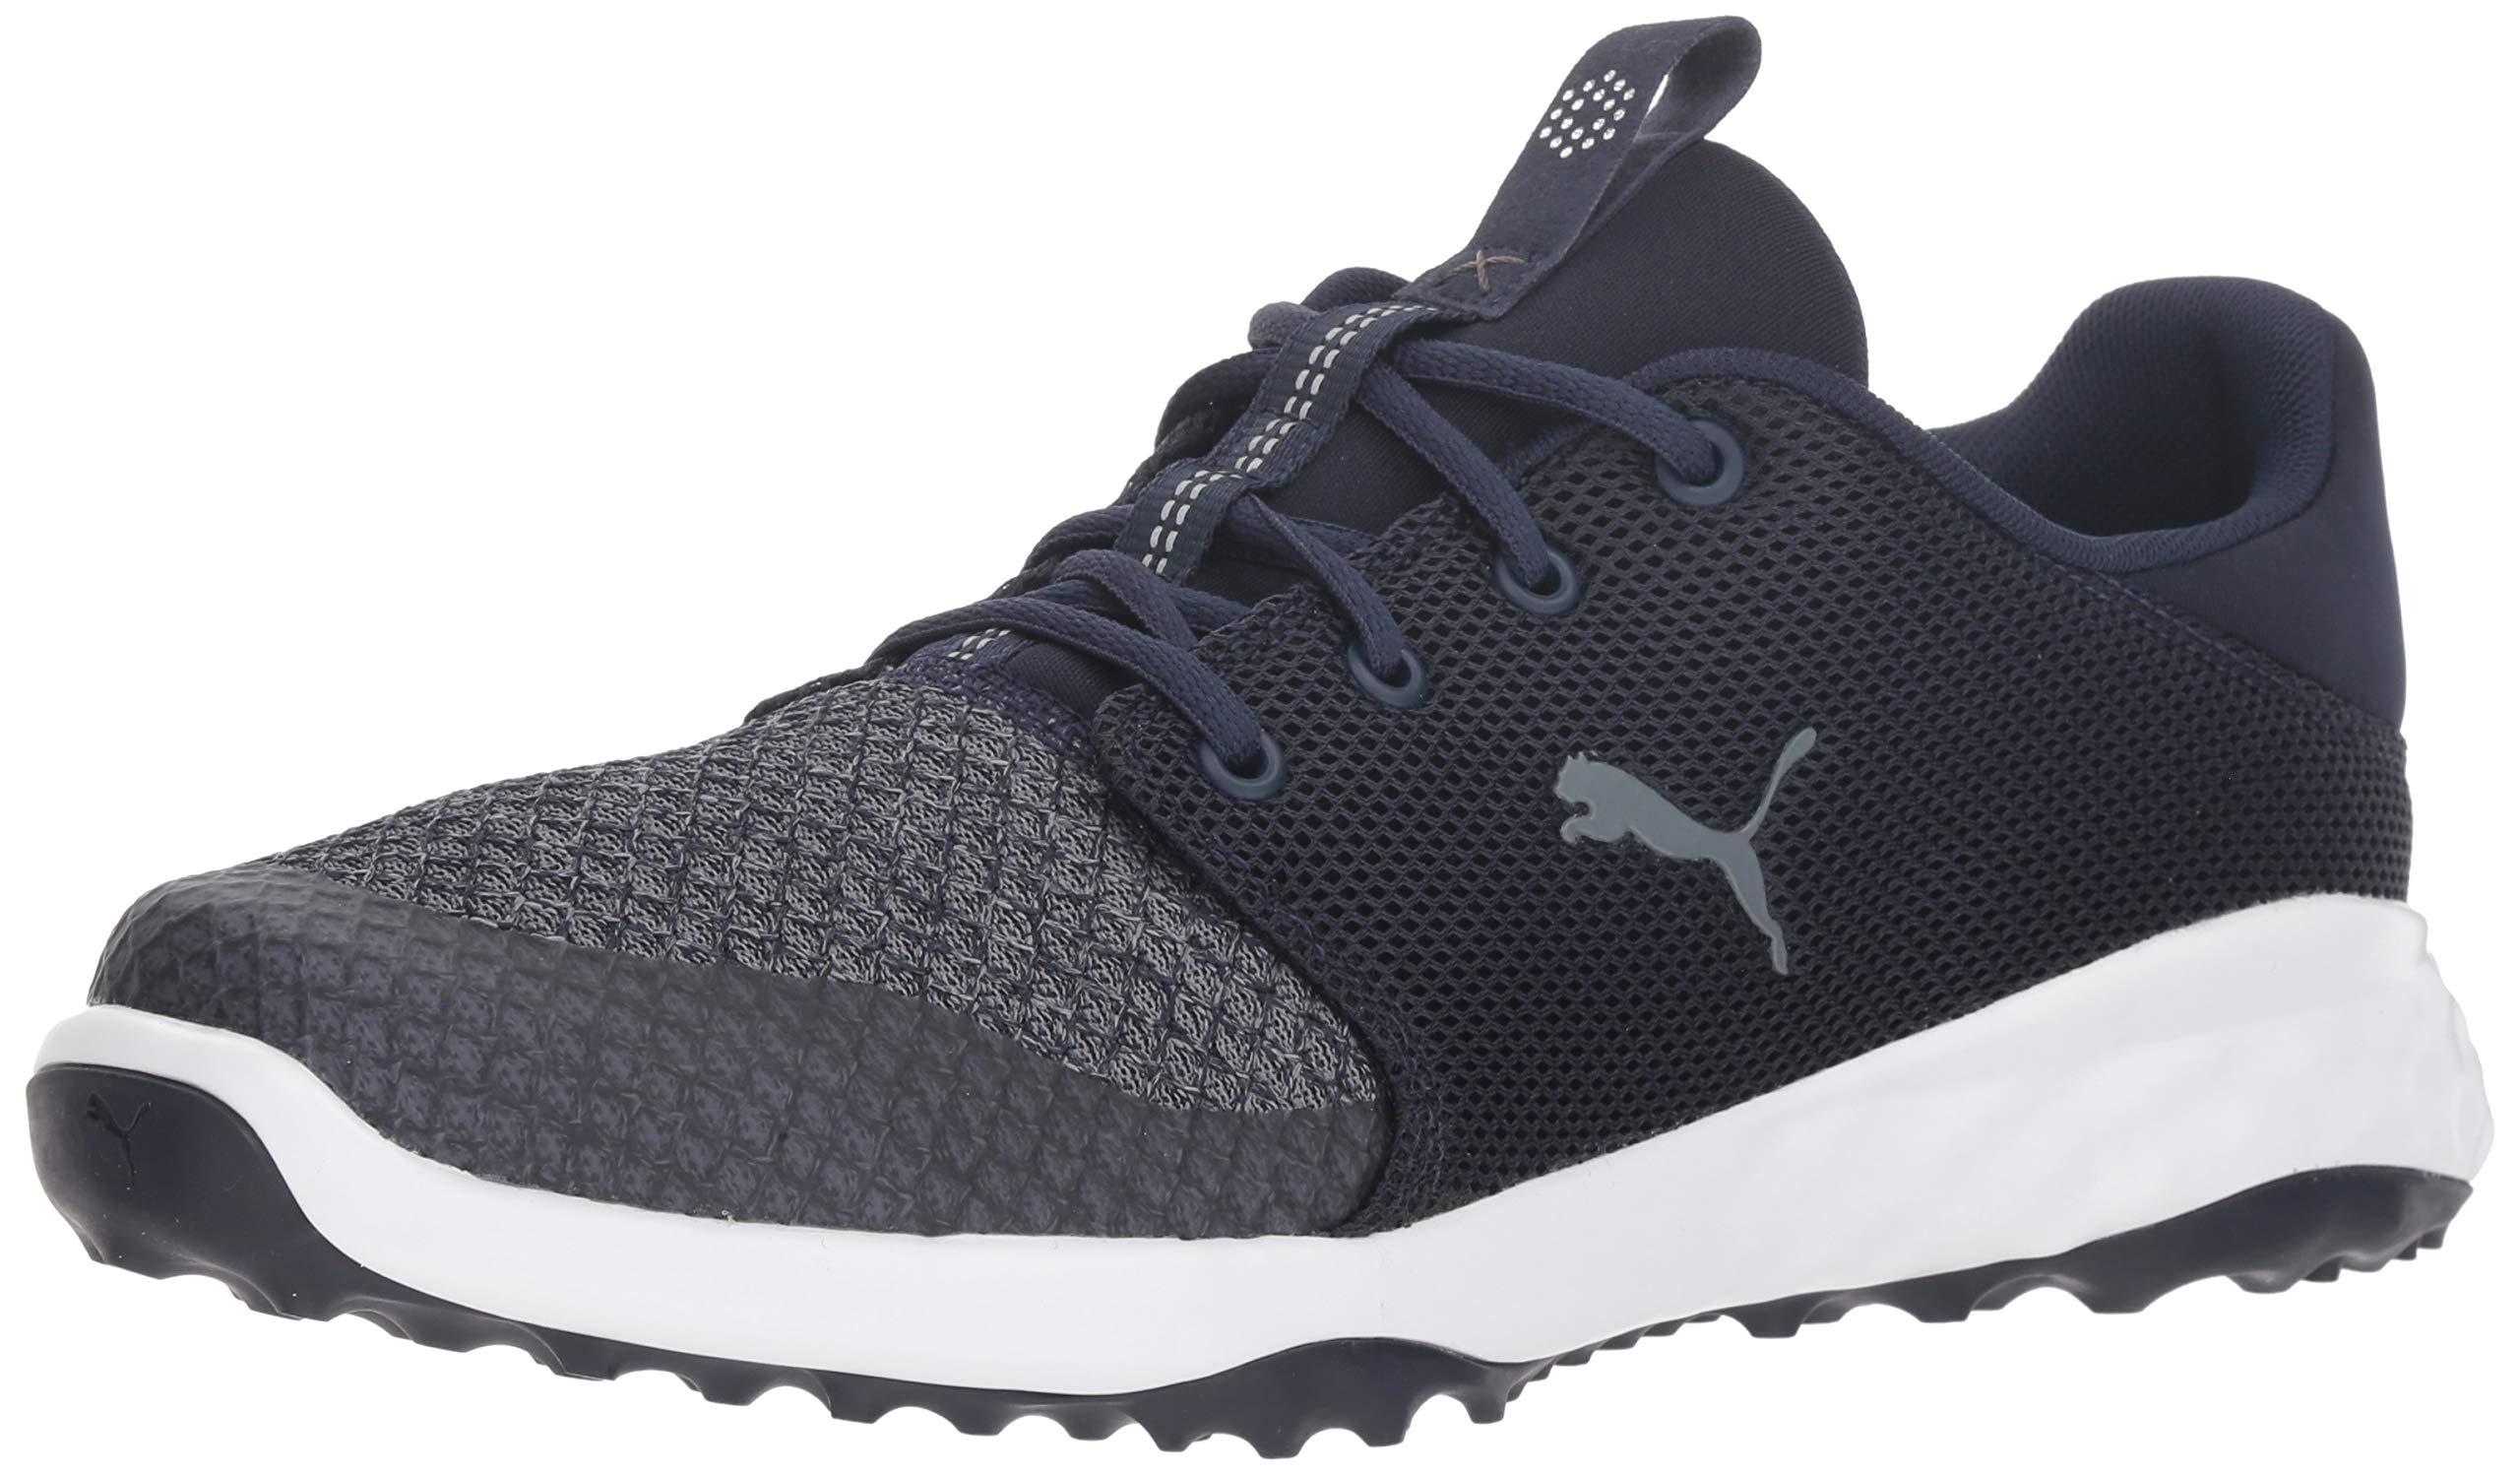 PUMA Golf Men's Grip Fusion Sport Golf Shoe, Peacoat-Quiet Shade, 10 M US by PUMA